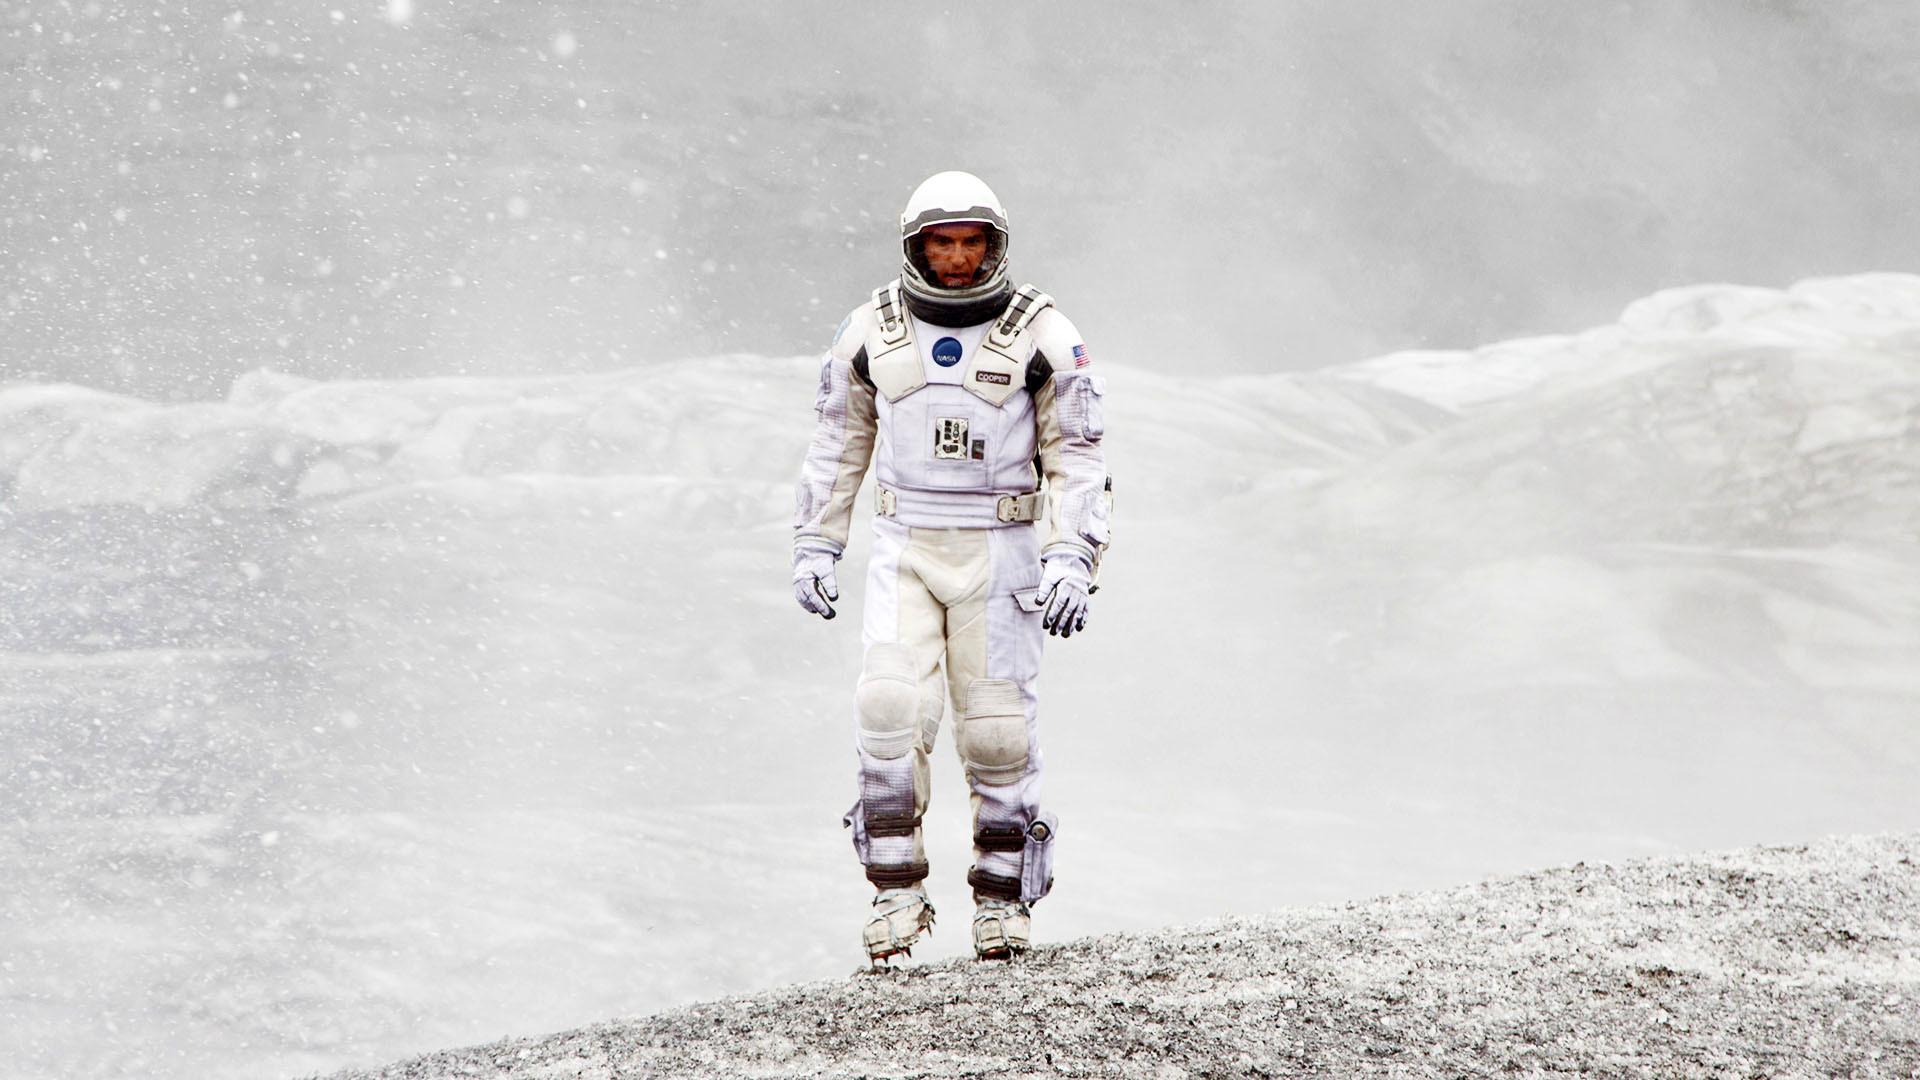 Interstellar, Cooper exploring, wearing space suit wallpaper